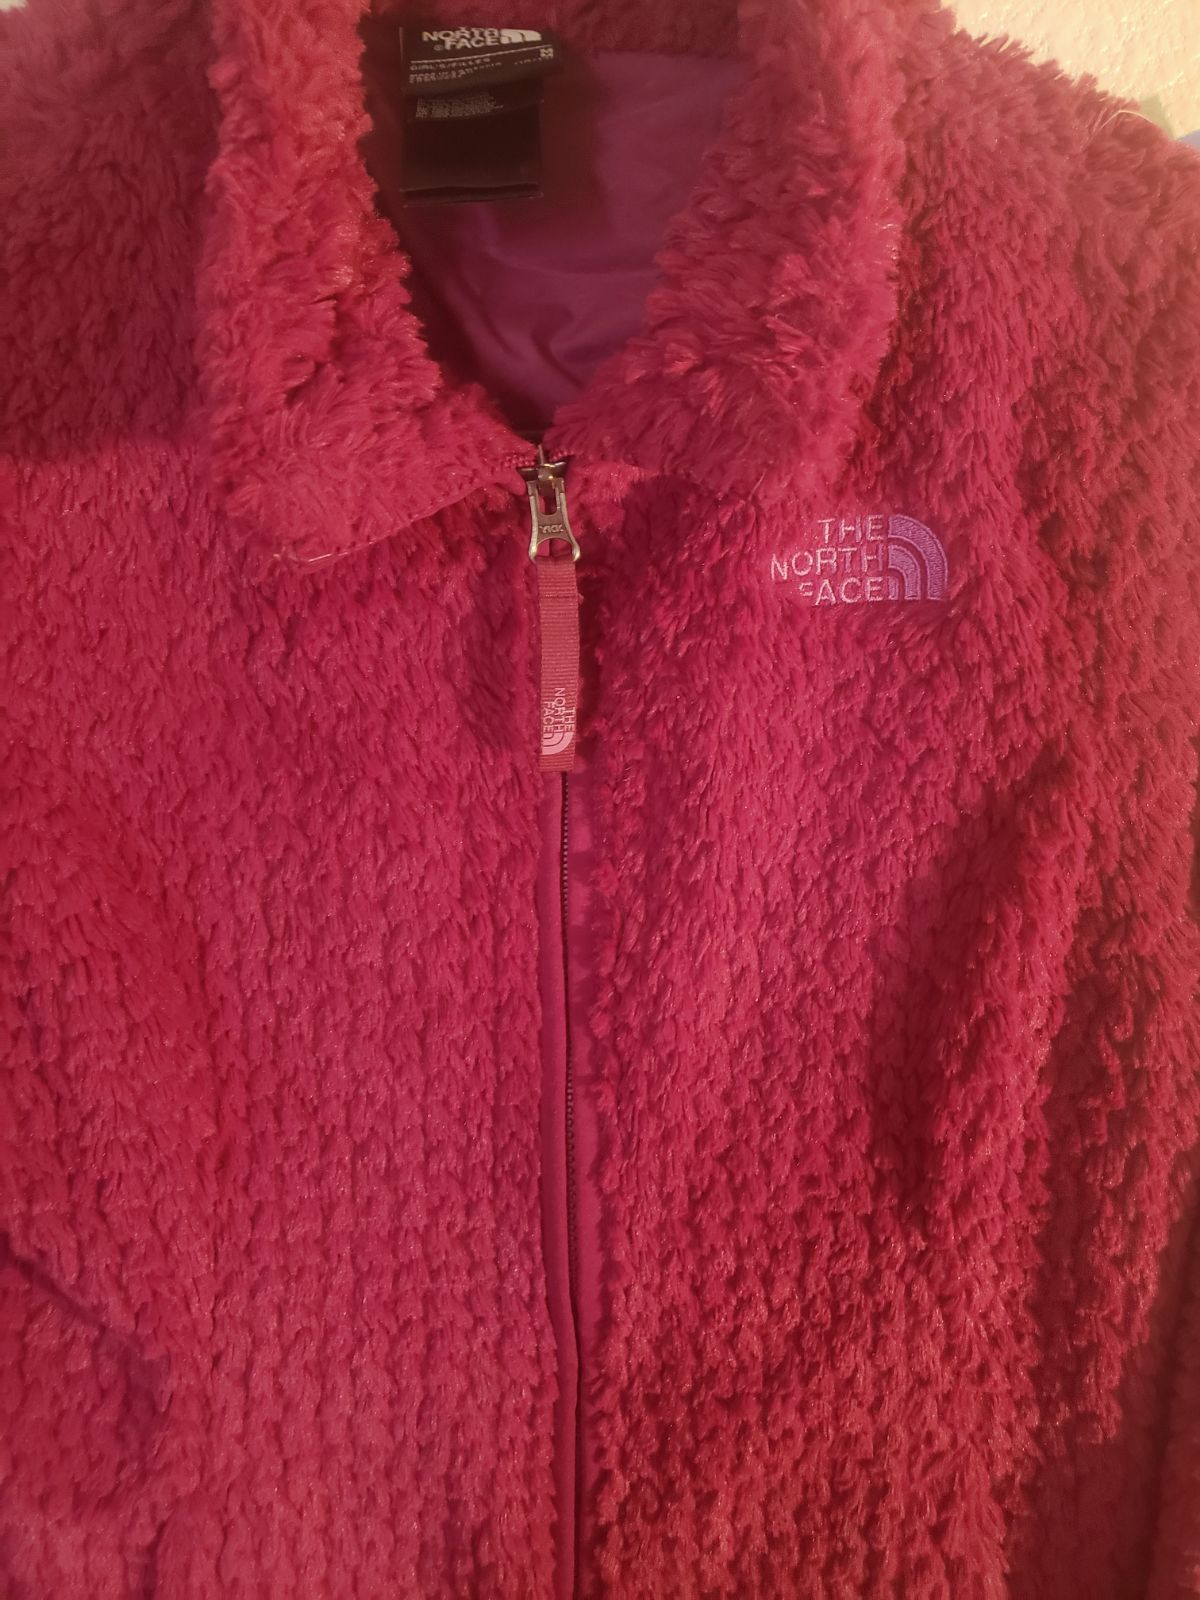 Girls 10/12 (M) North Face Jacket